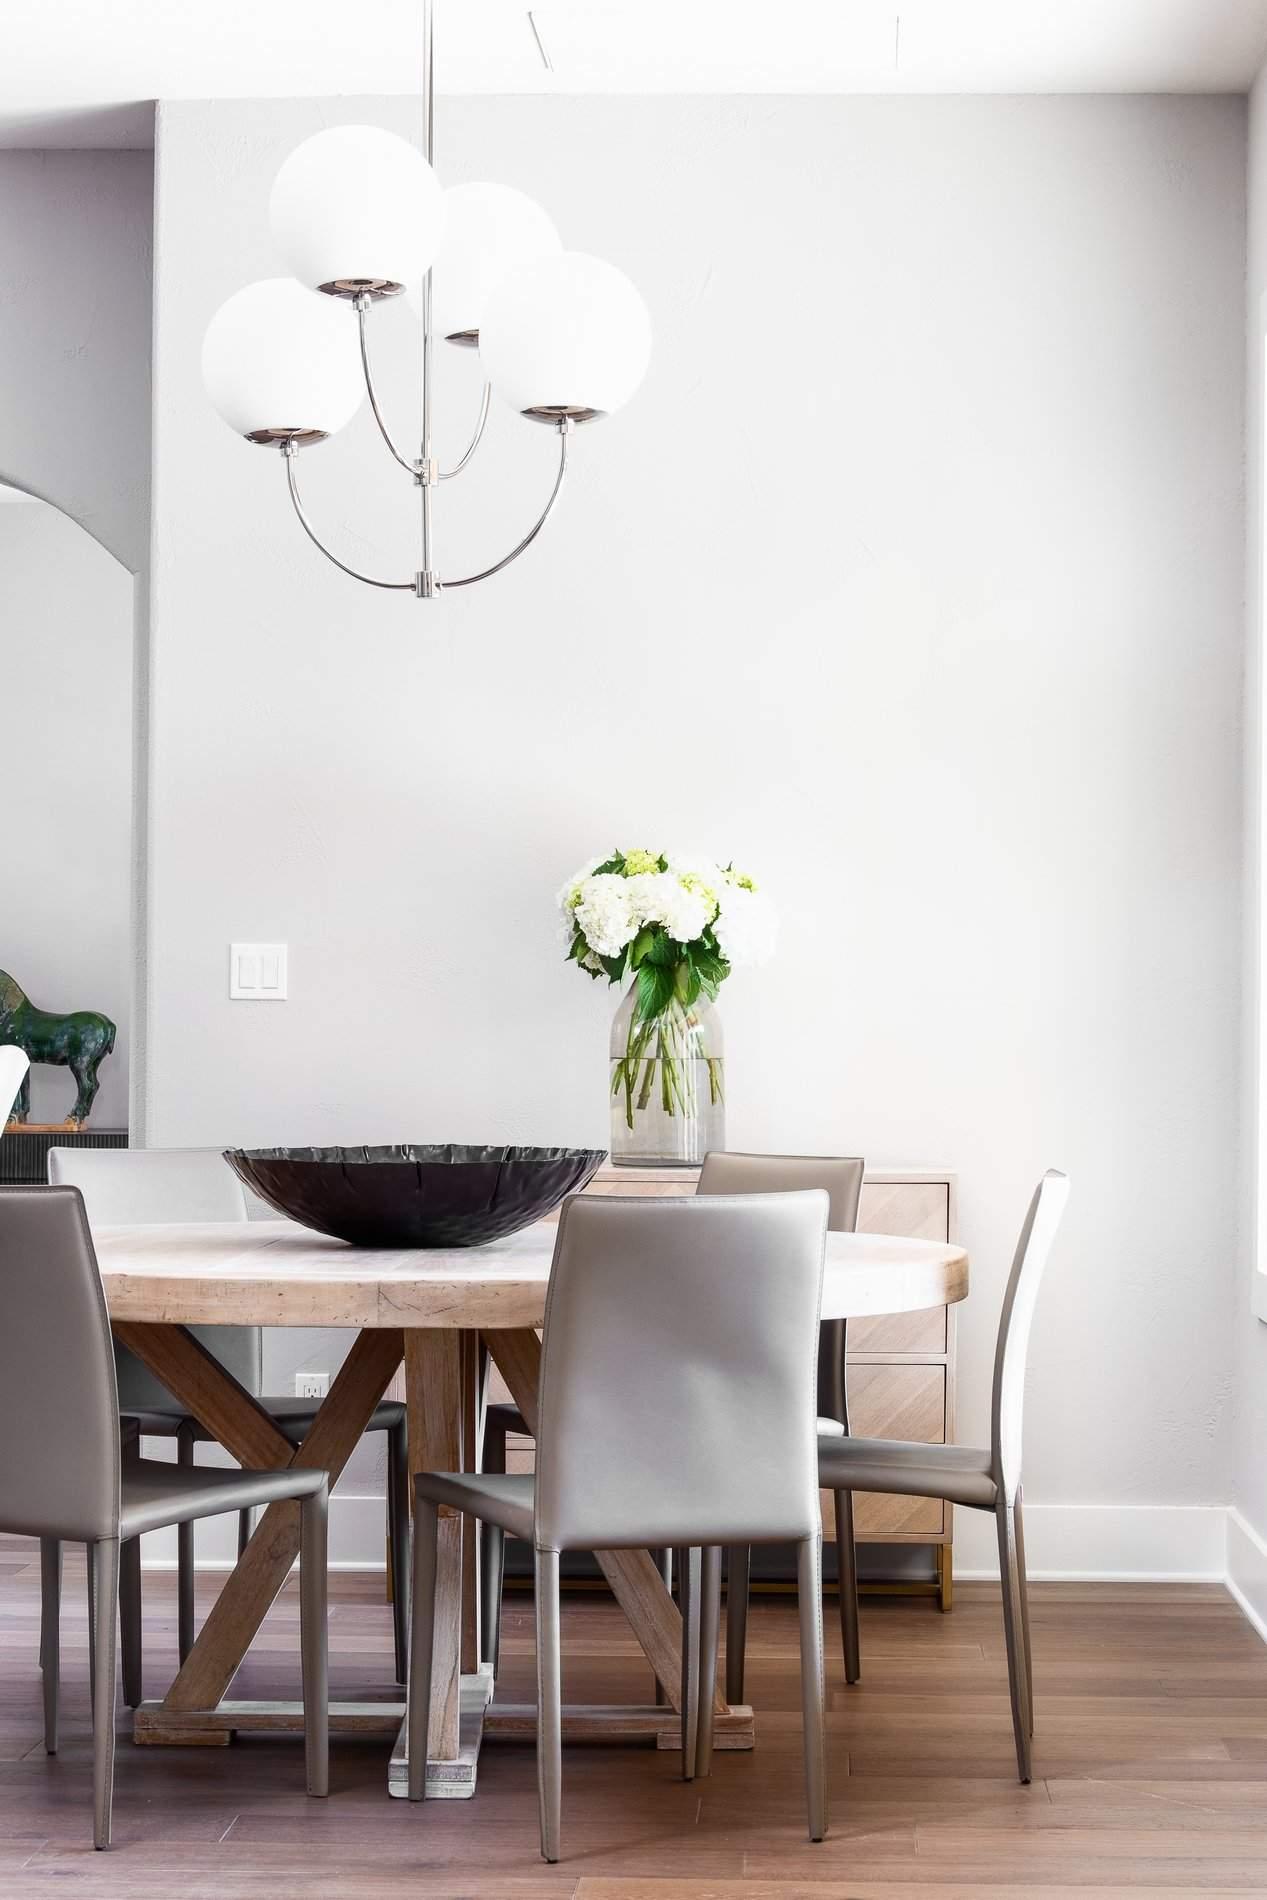 interior design austin | dining table with chandelier | austin, texas